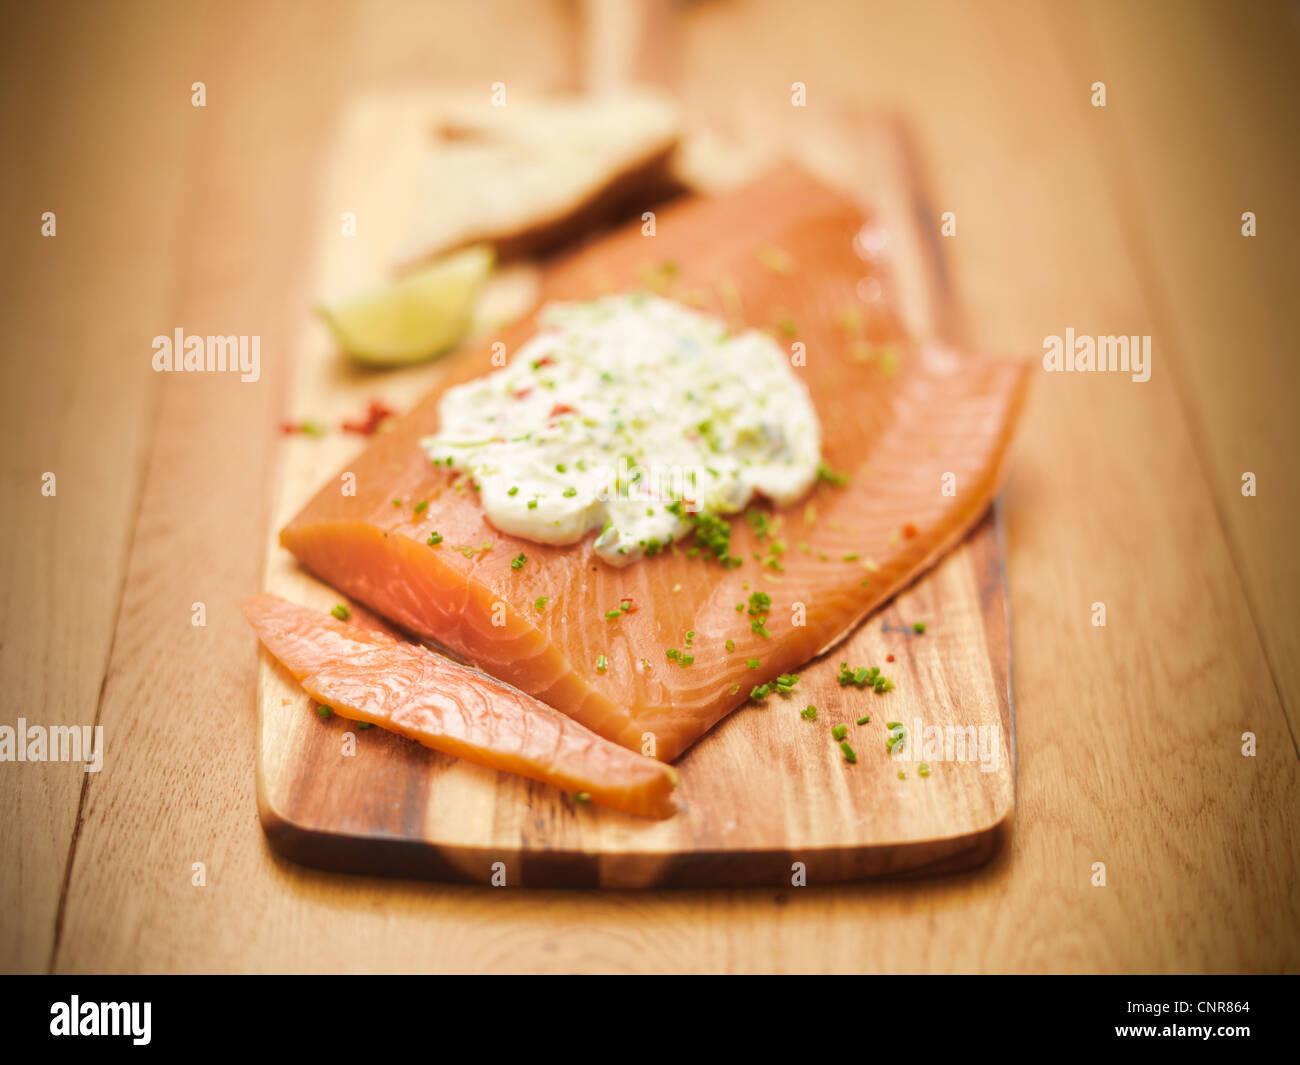 Plate of salmon with tartar sauce - Stock Image